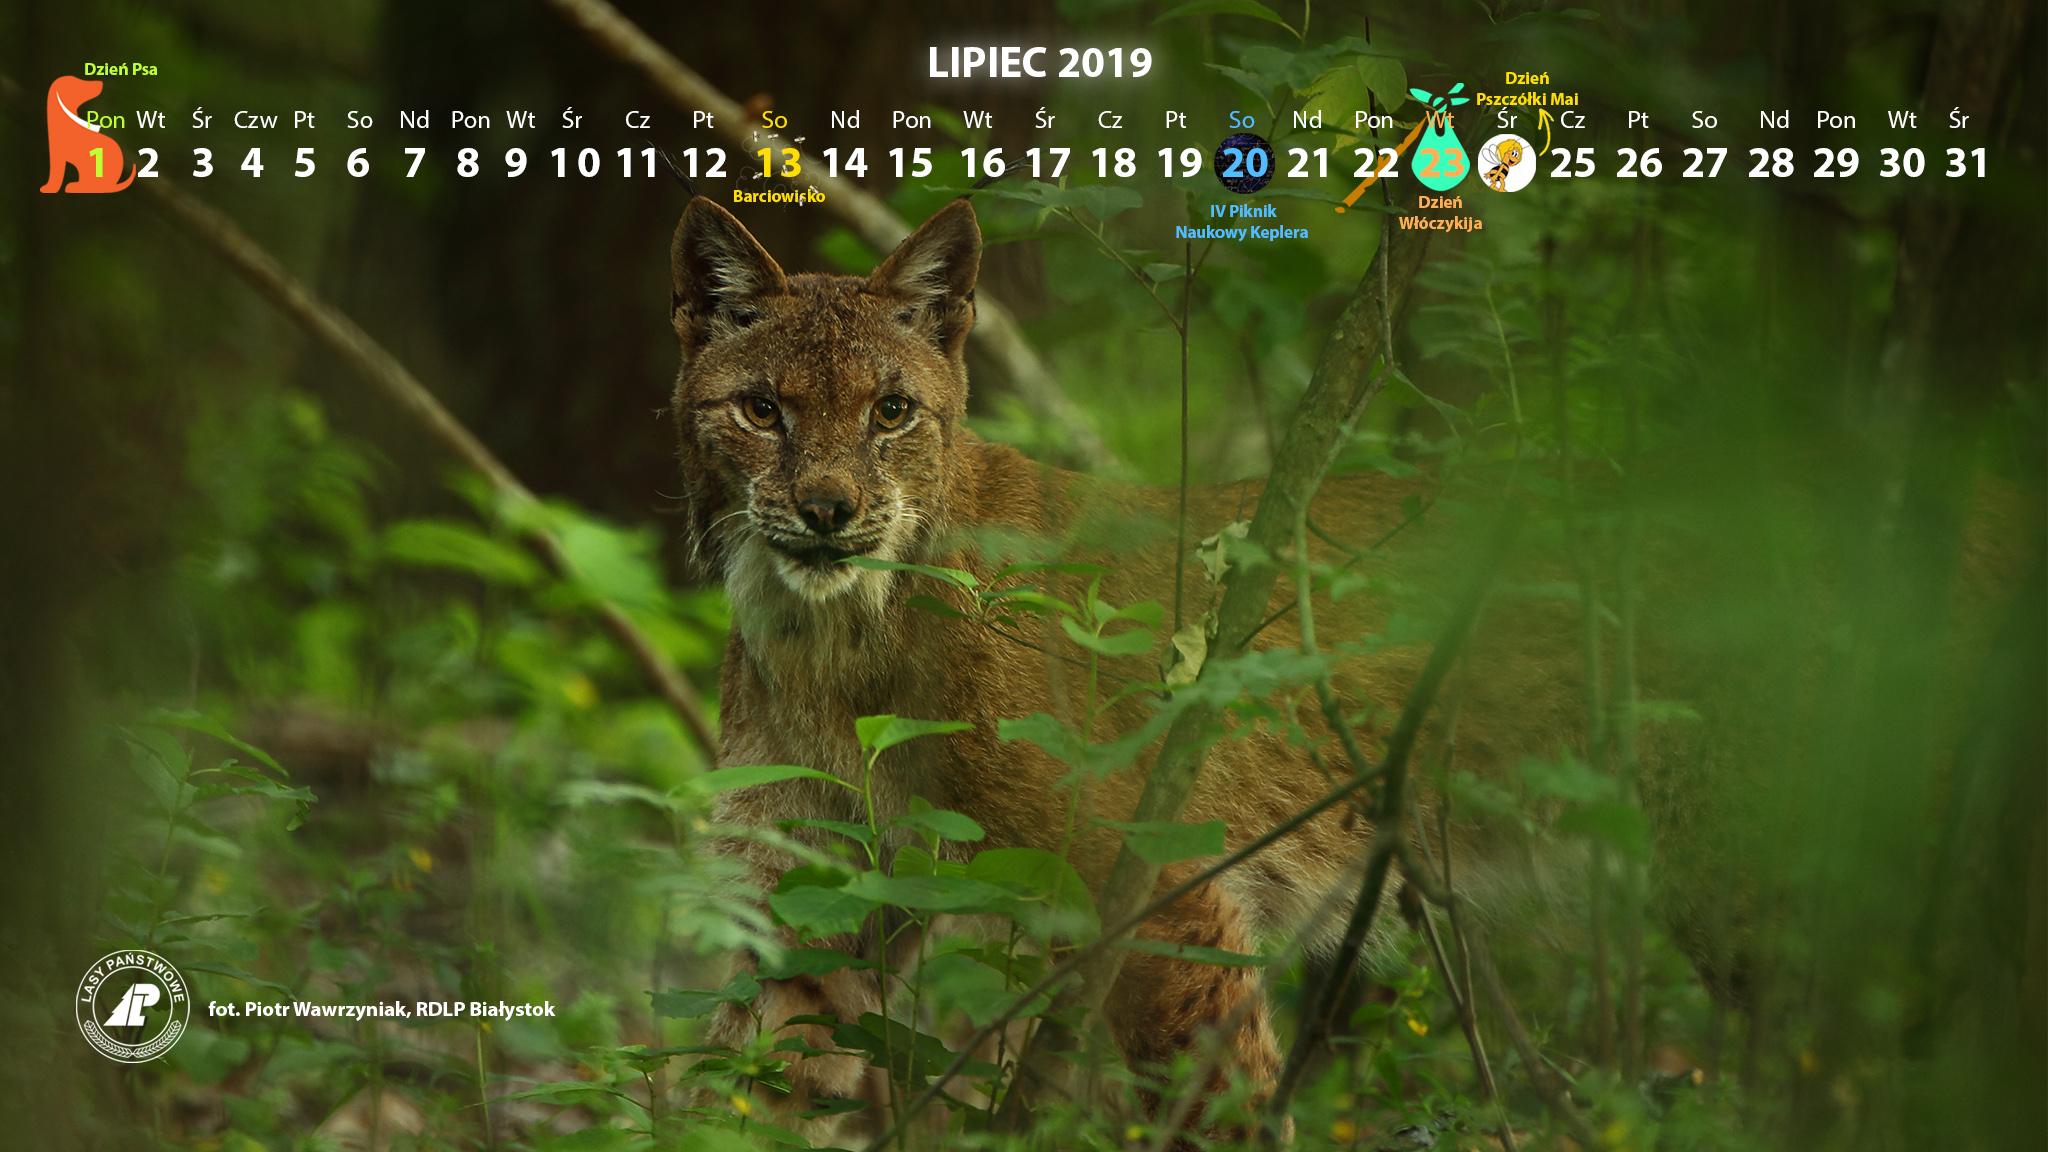 Kalendarz_lipiec2019_2048x1152[1].jpg